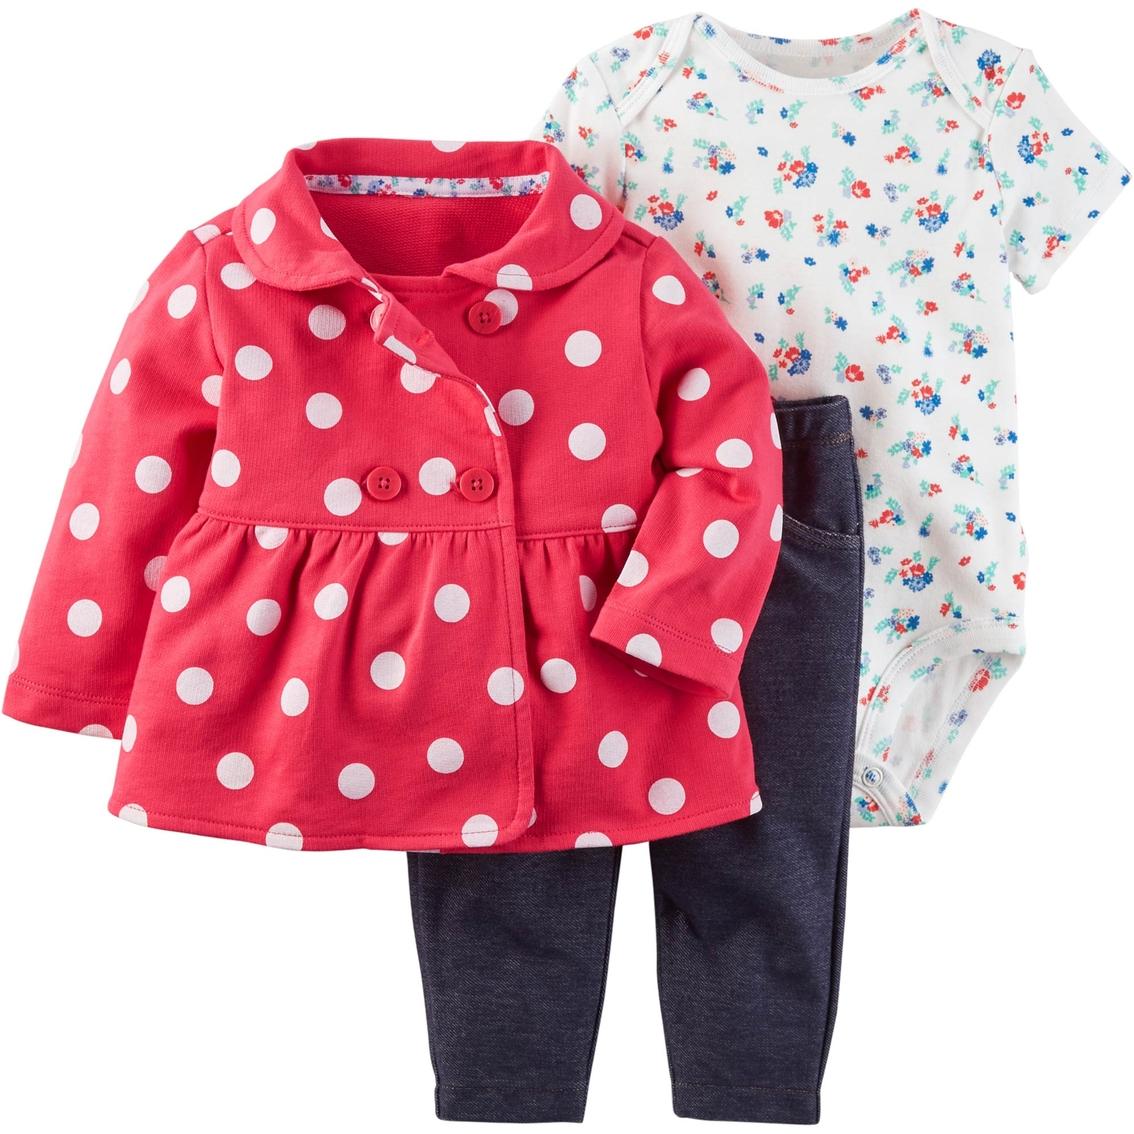 dc175329d Carter s Cardi Infant Girls 3 Pc. Little Jacket Set